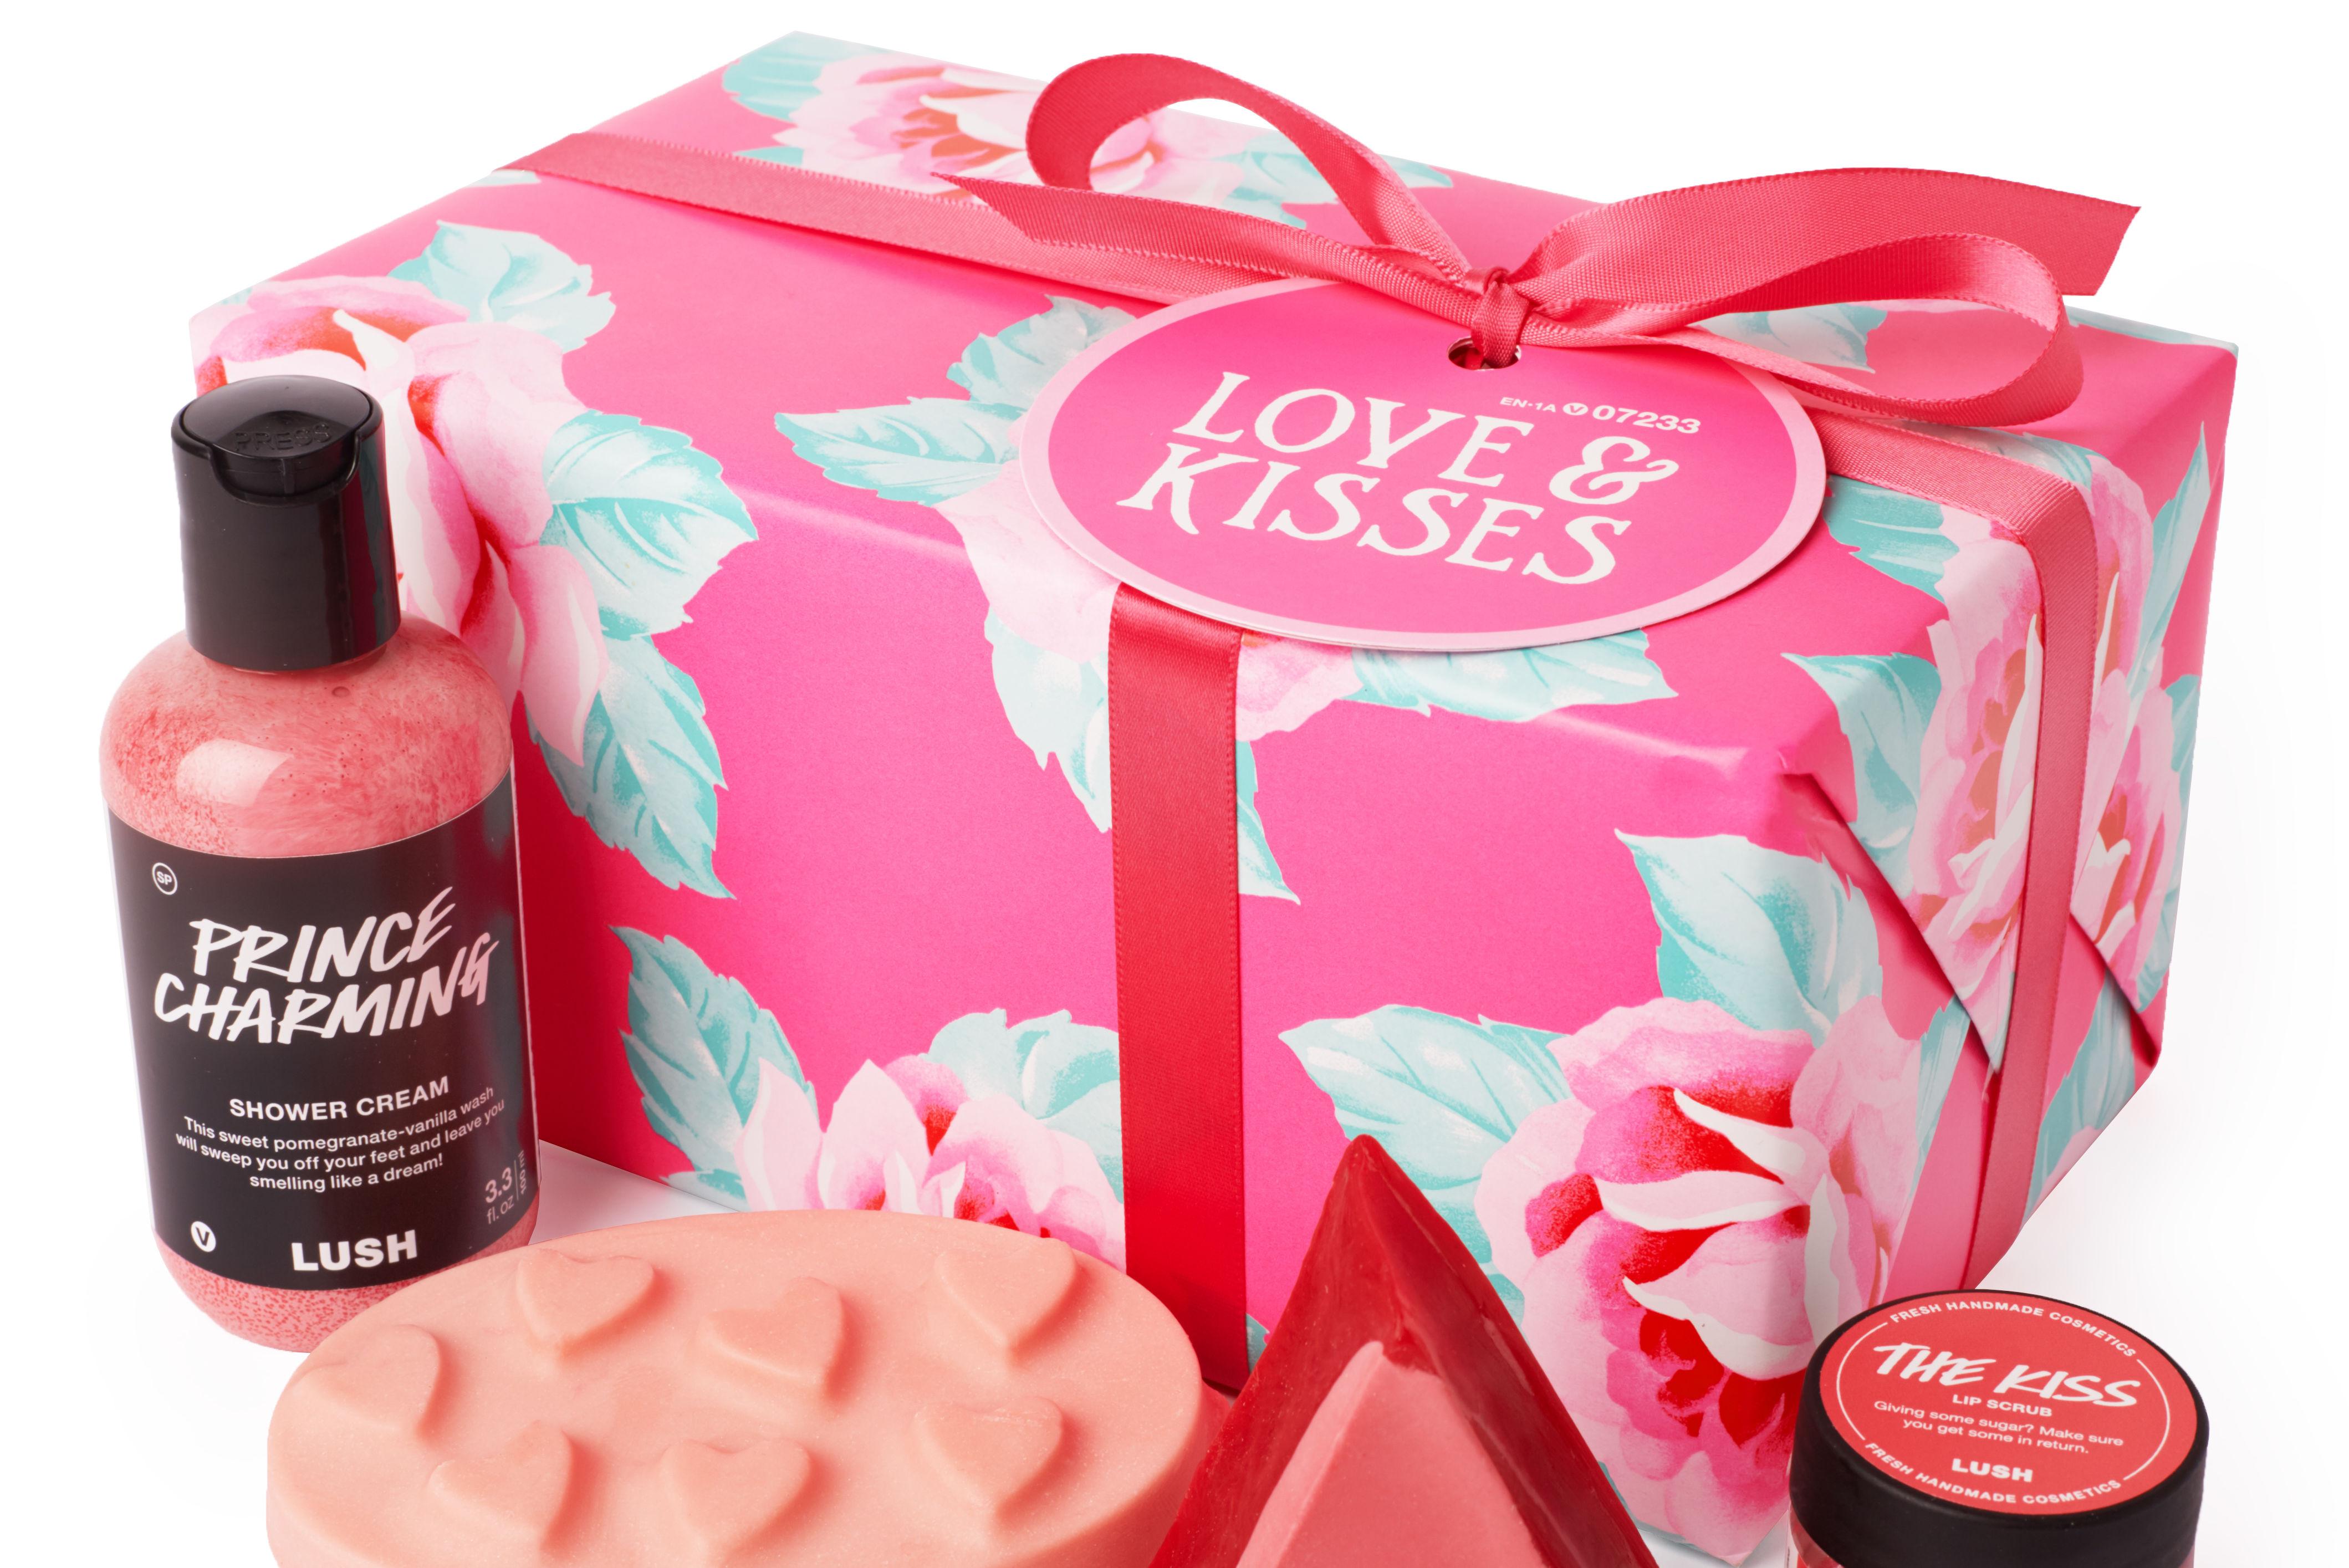 Loveandkisses gift pdp en  1  nlnswo